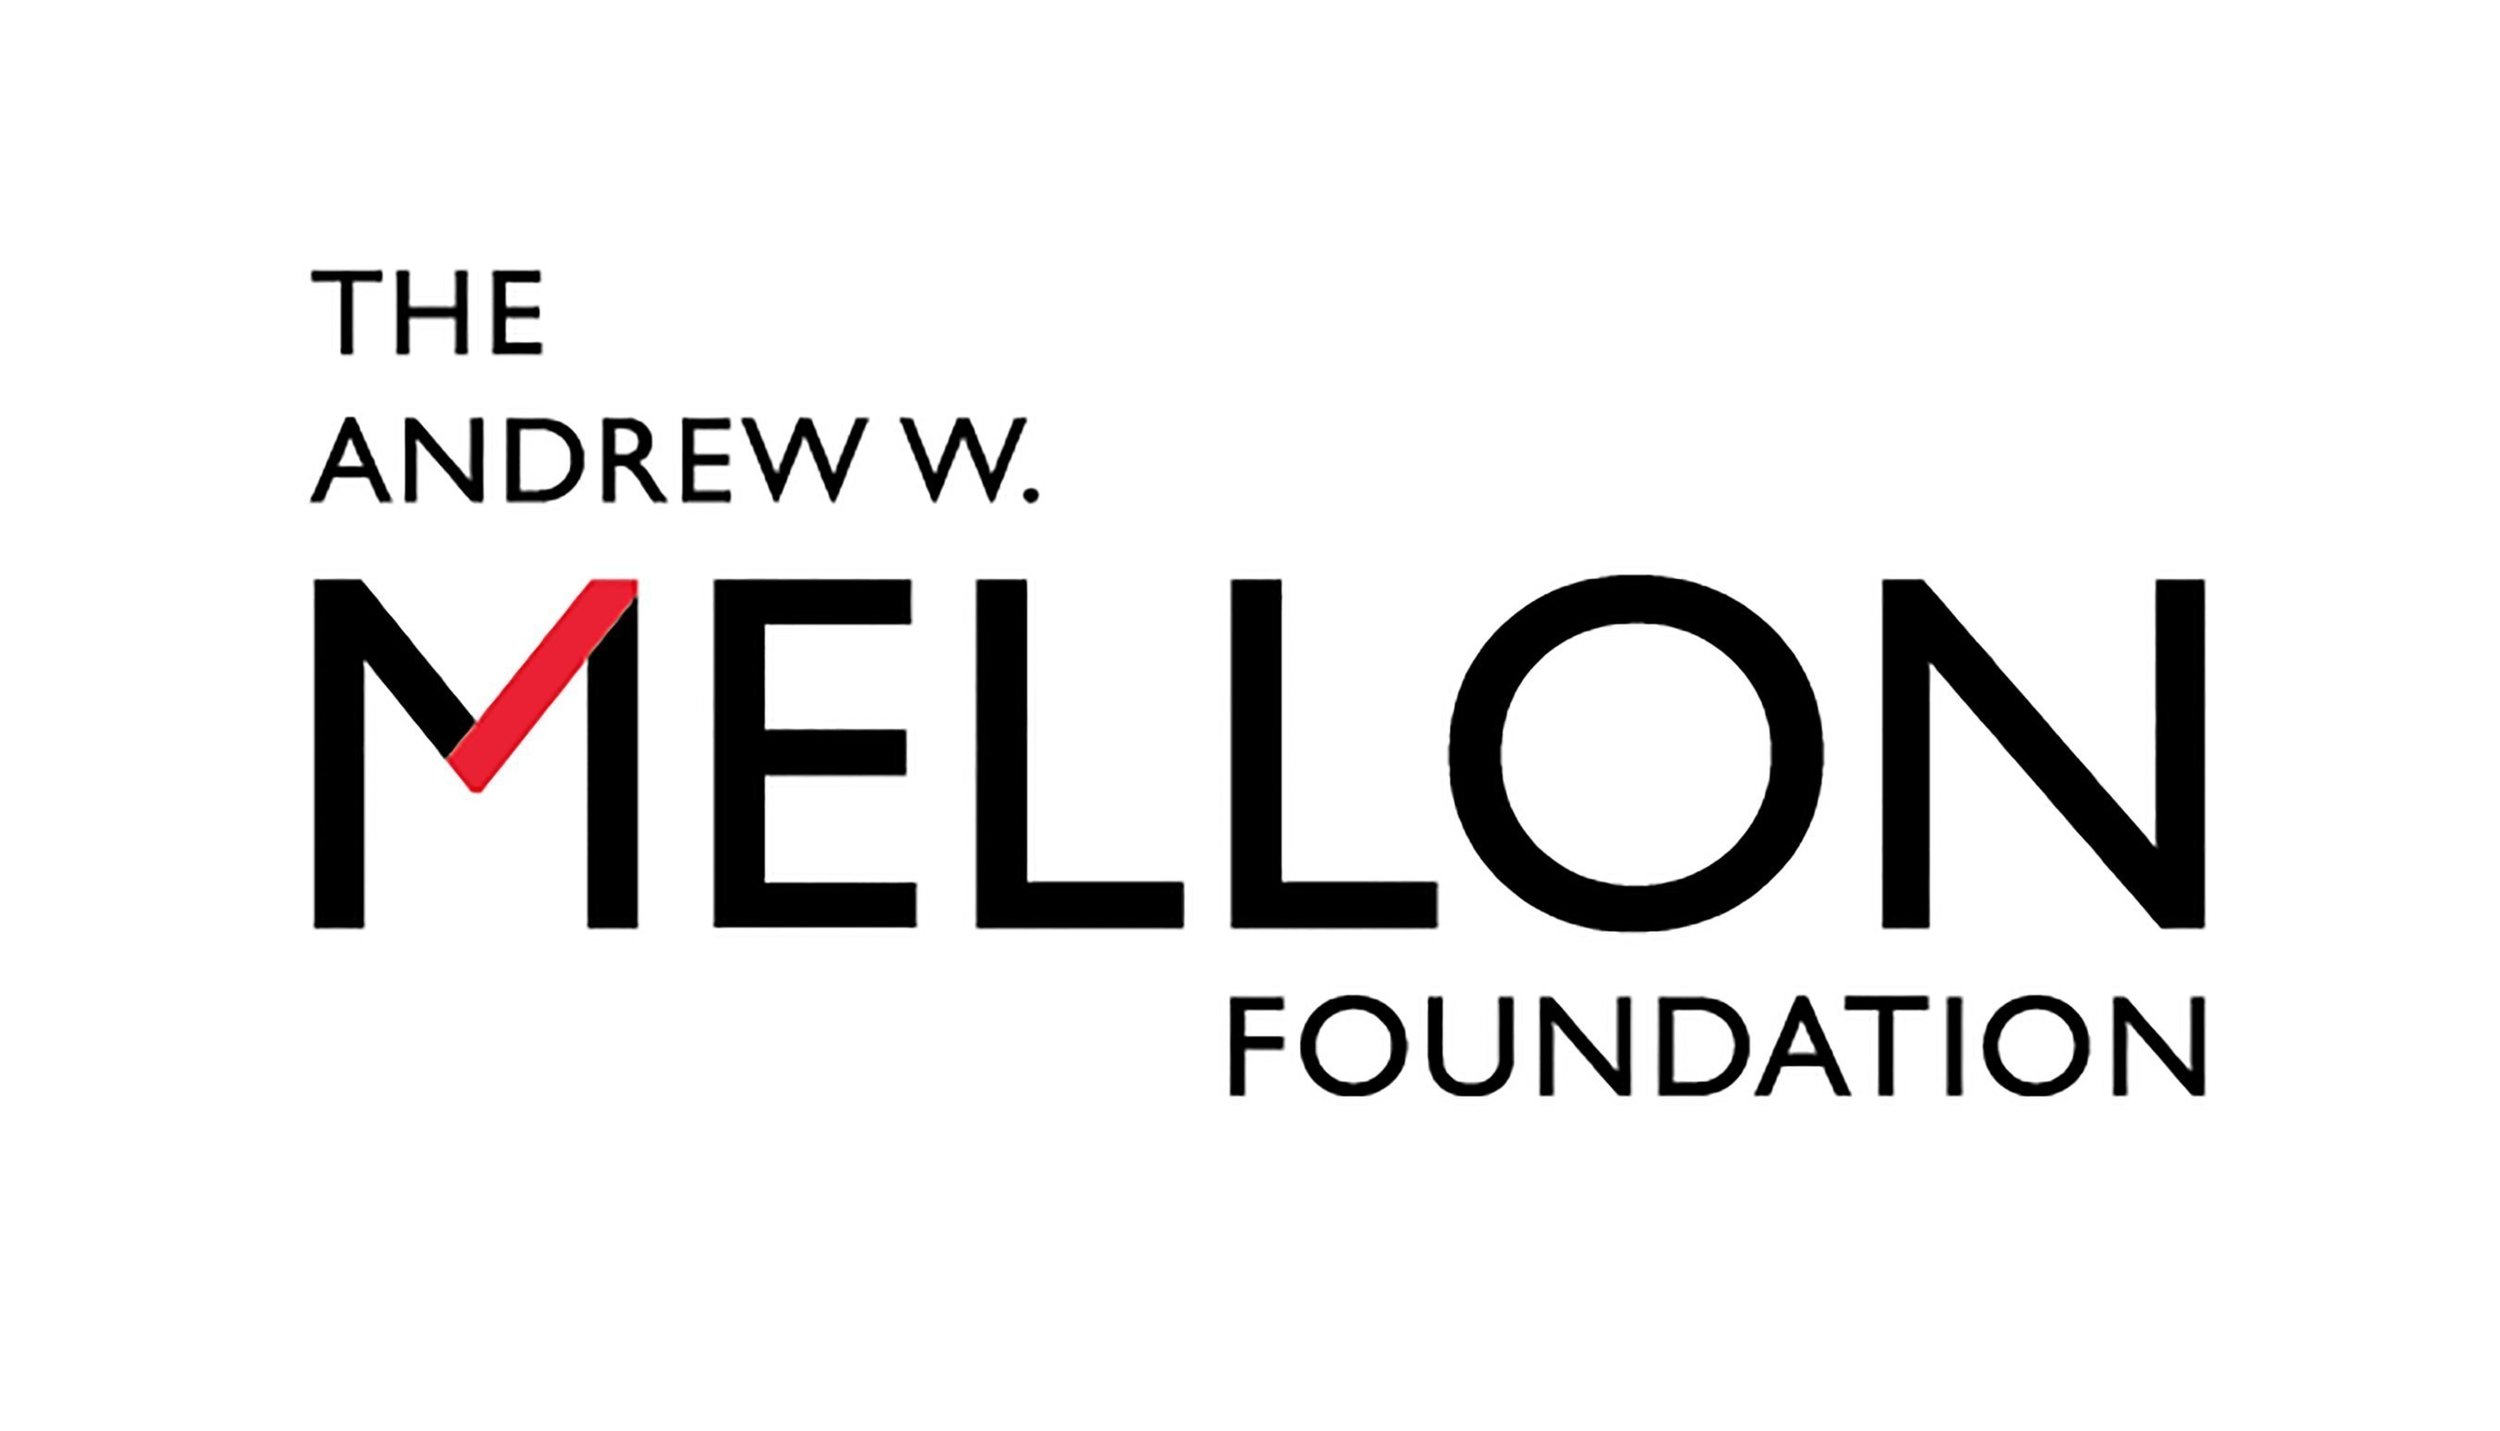 The-Andrew-W.-Mellon-Foundation.jpeg